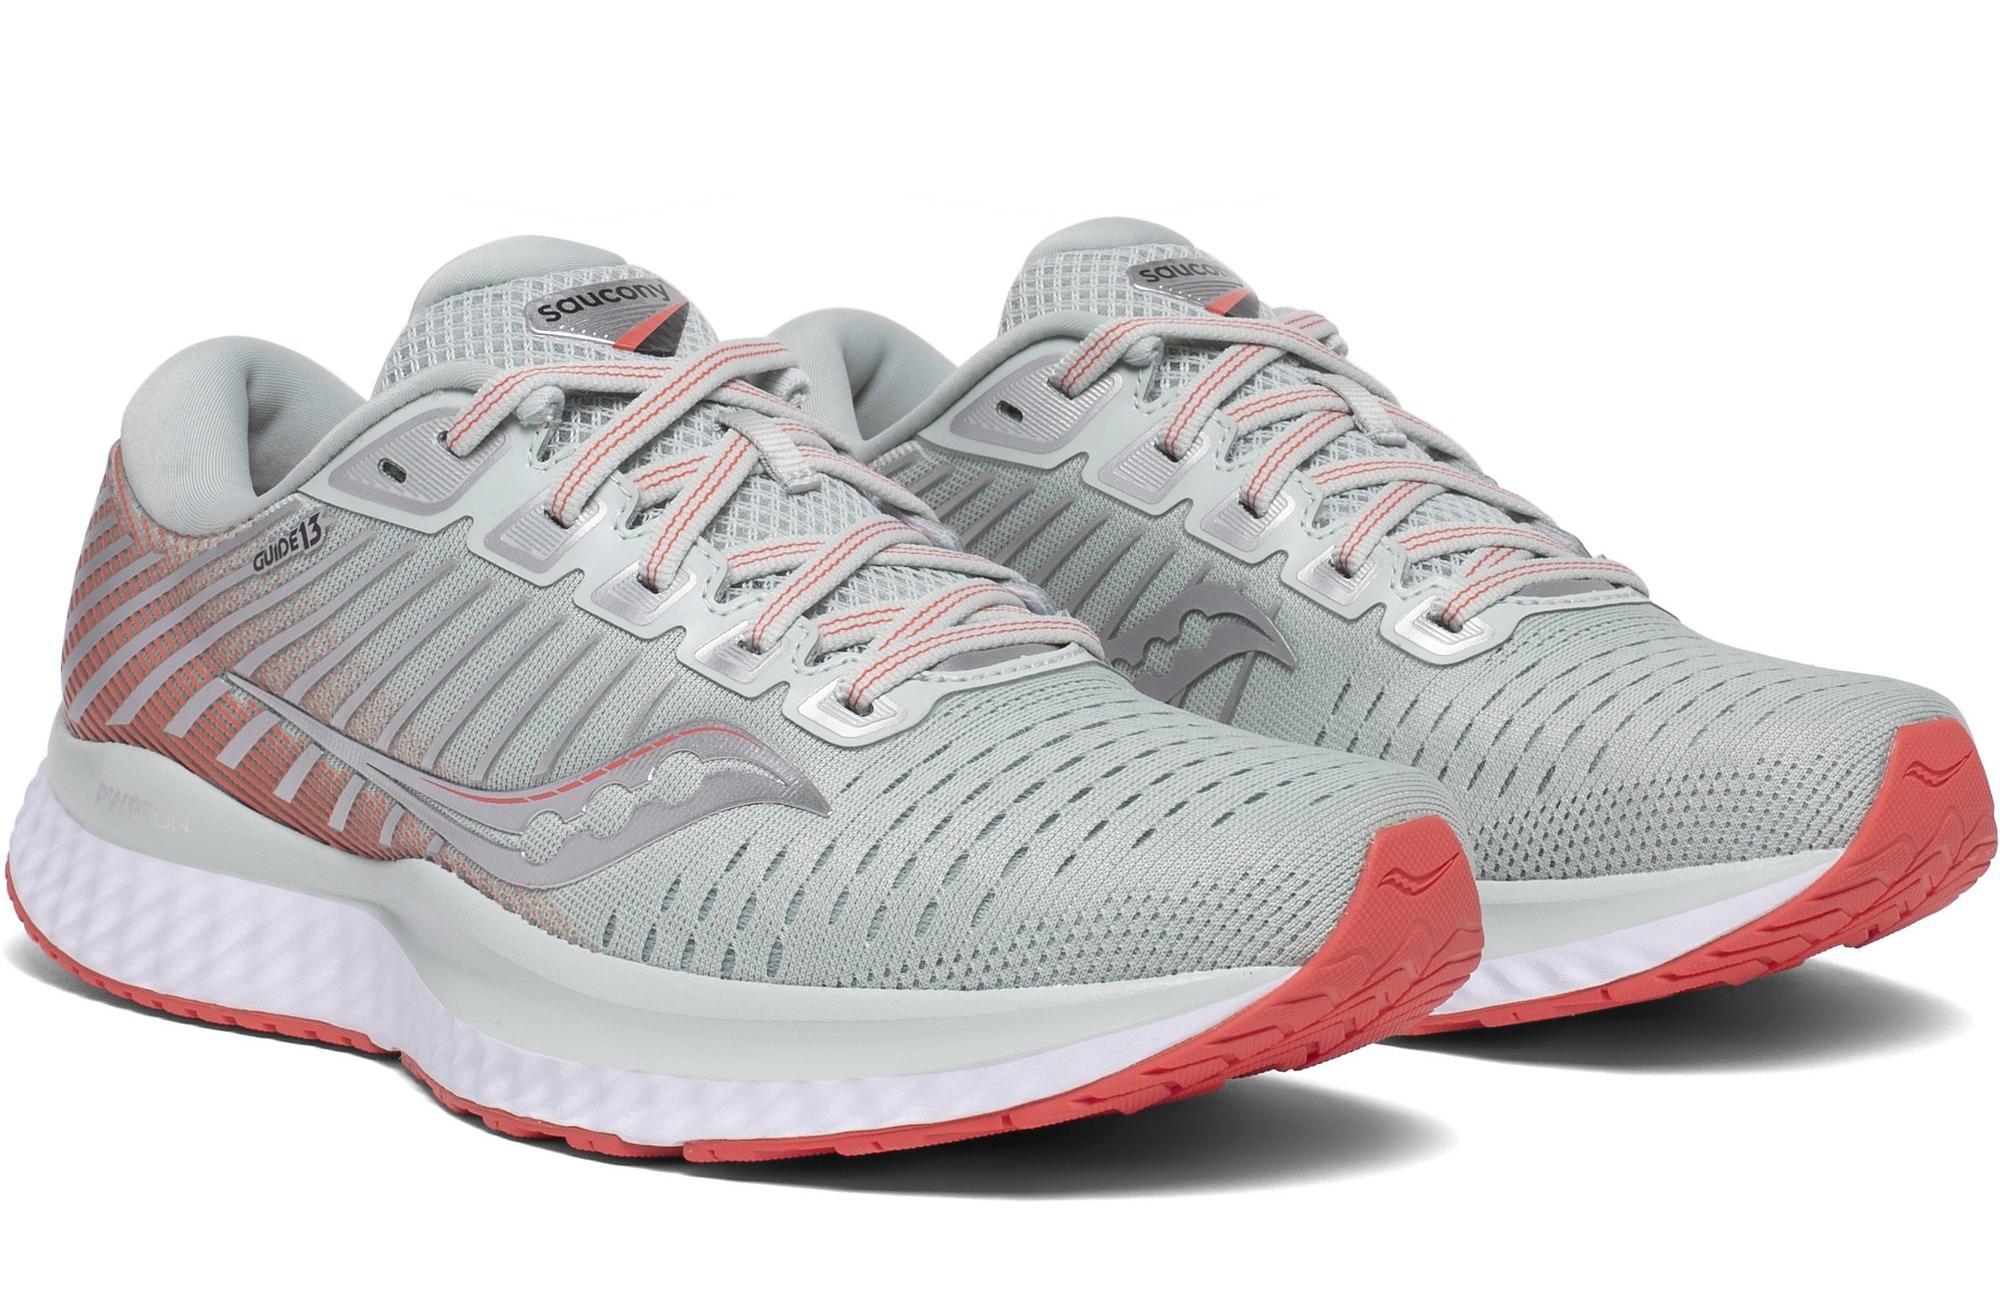 Saucony Guide 13 women's running shoe